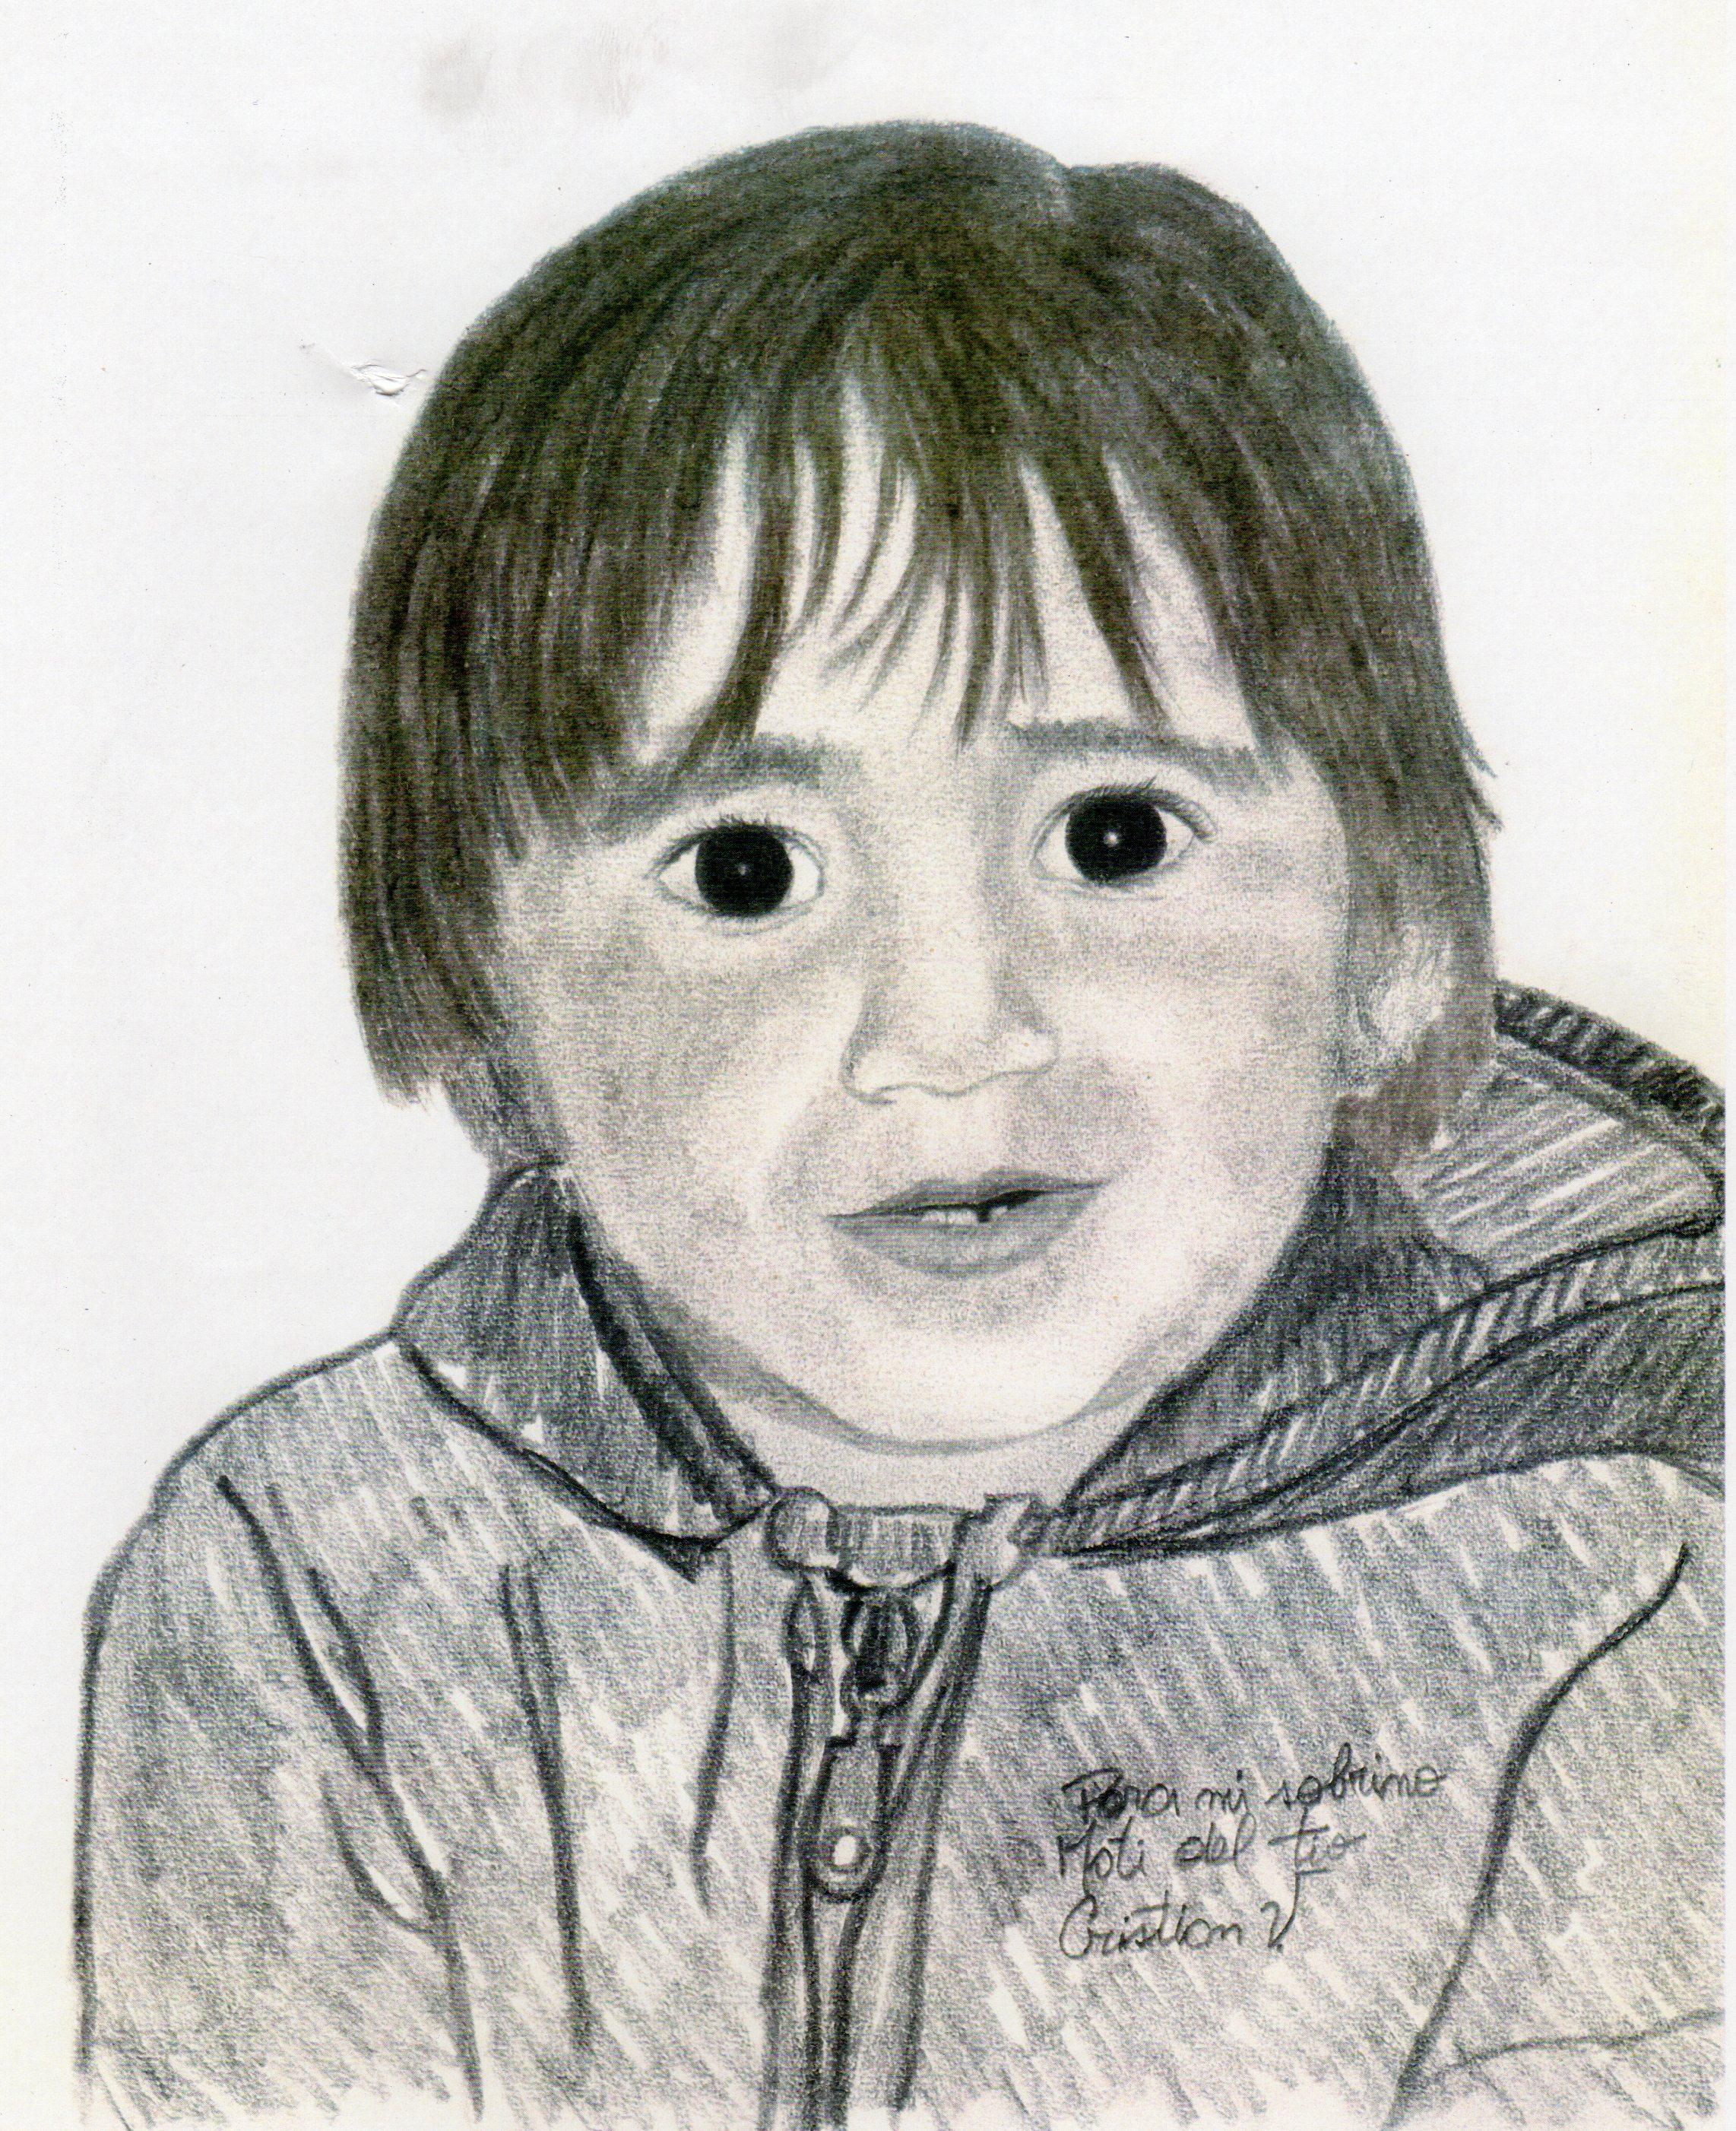 Retrato Matias